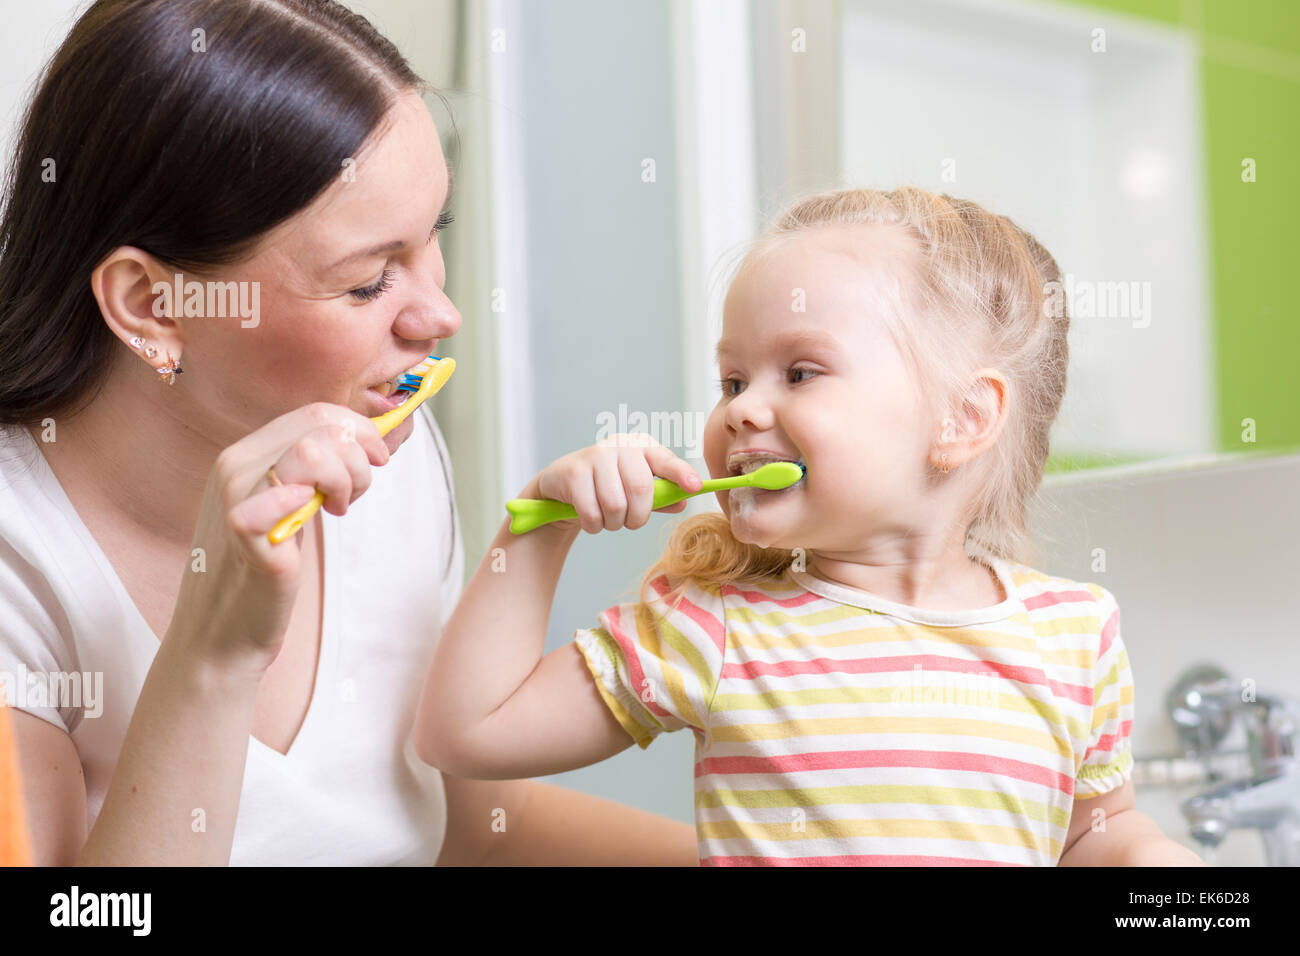 süße Mutter lehrt Kinder Zähne putzen Stockbild